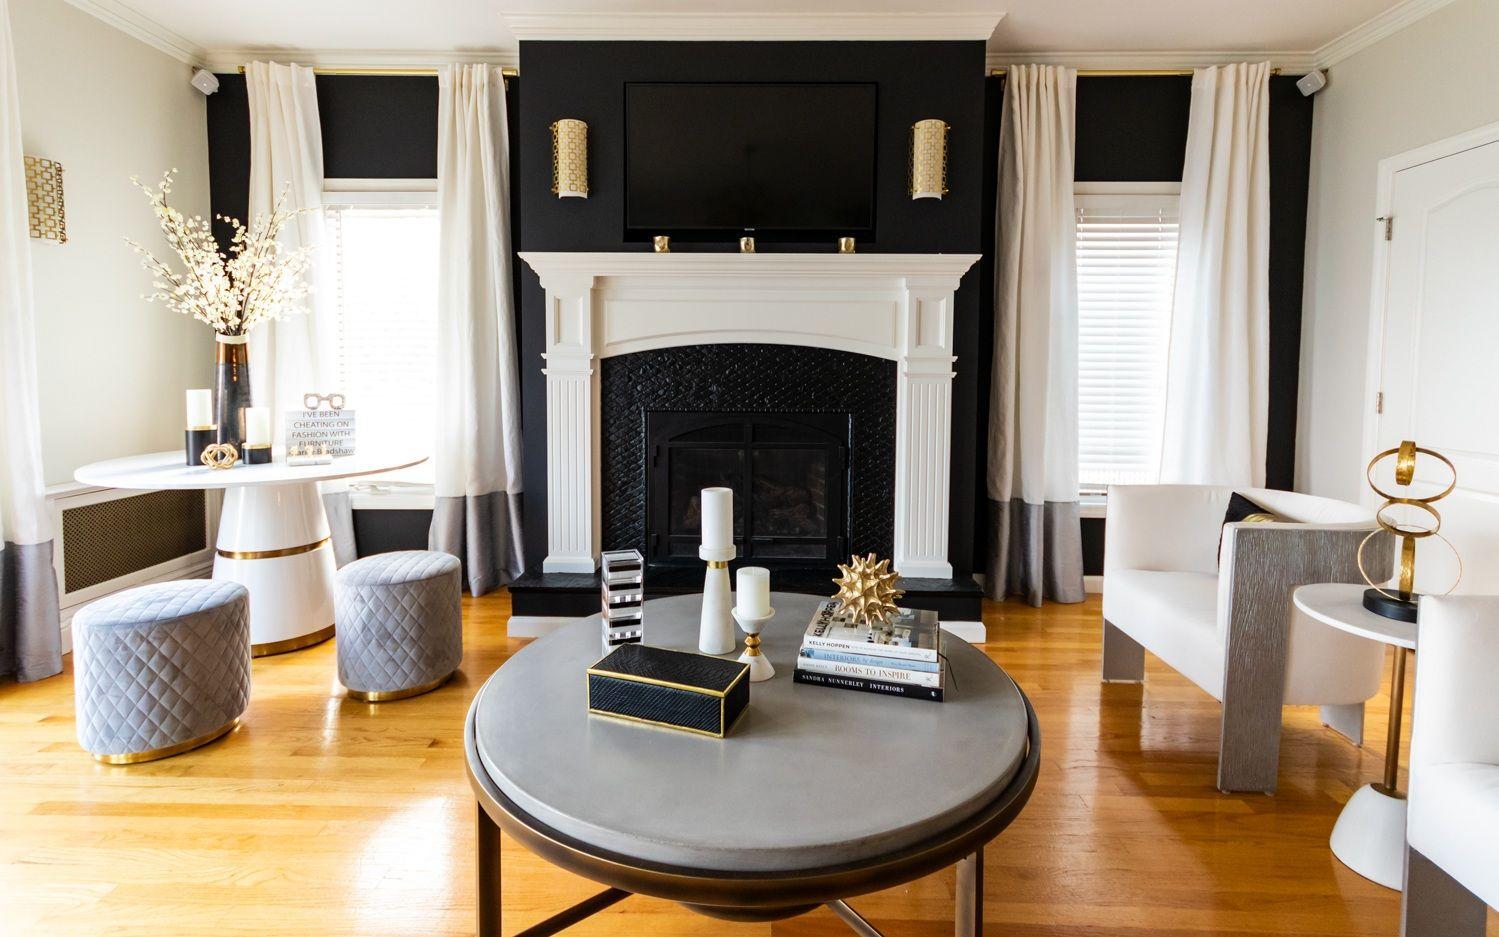 Neutral Living Room Iq Design Black Accent Wall Living Room Accent Walls In Living Room Contemporary Interior Design Living Room